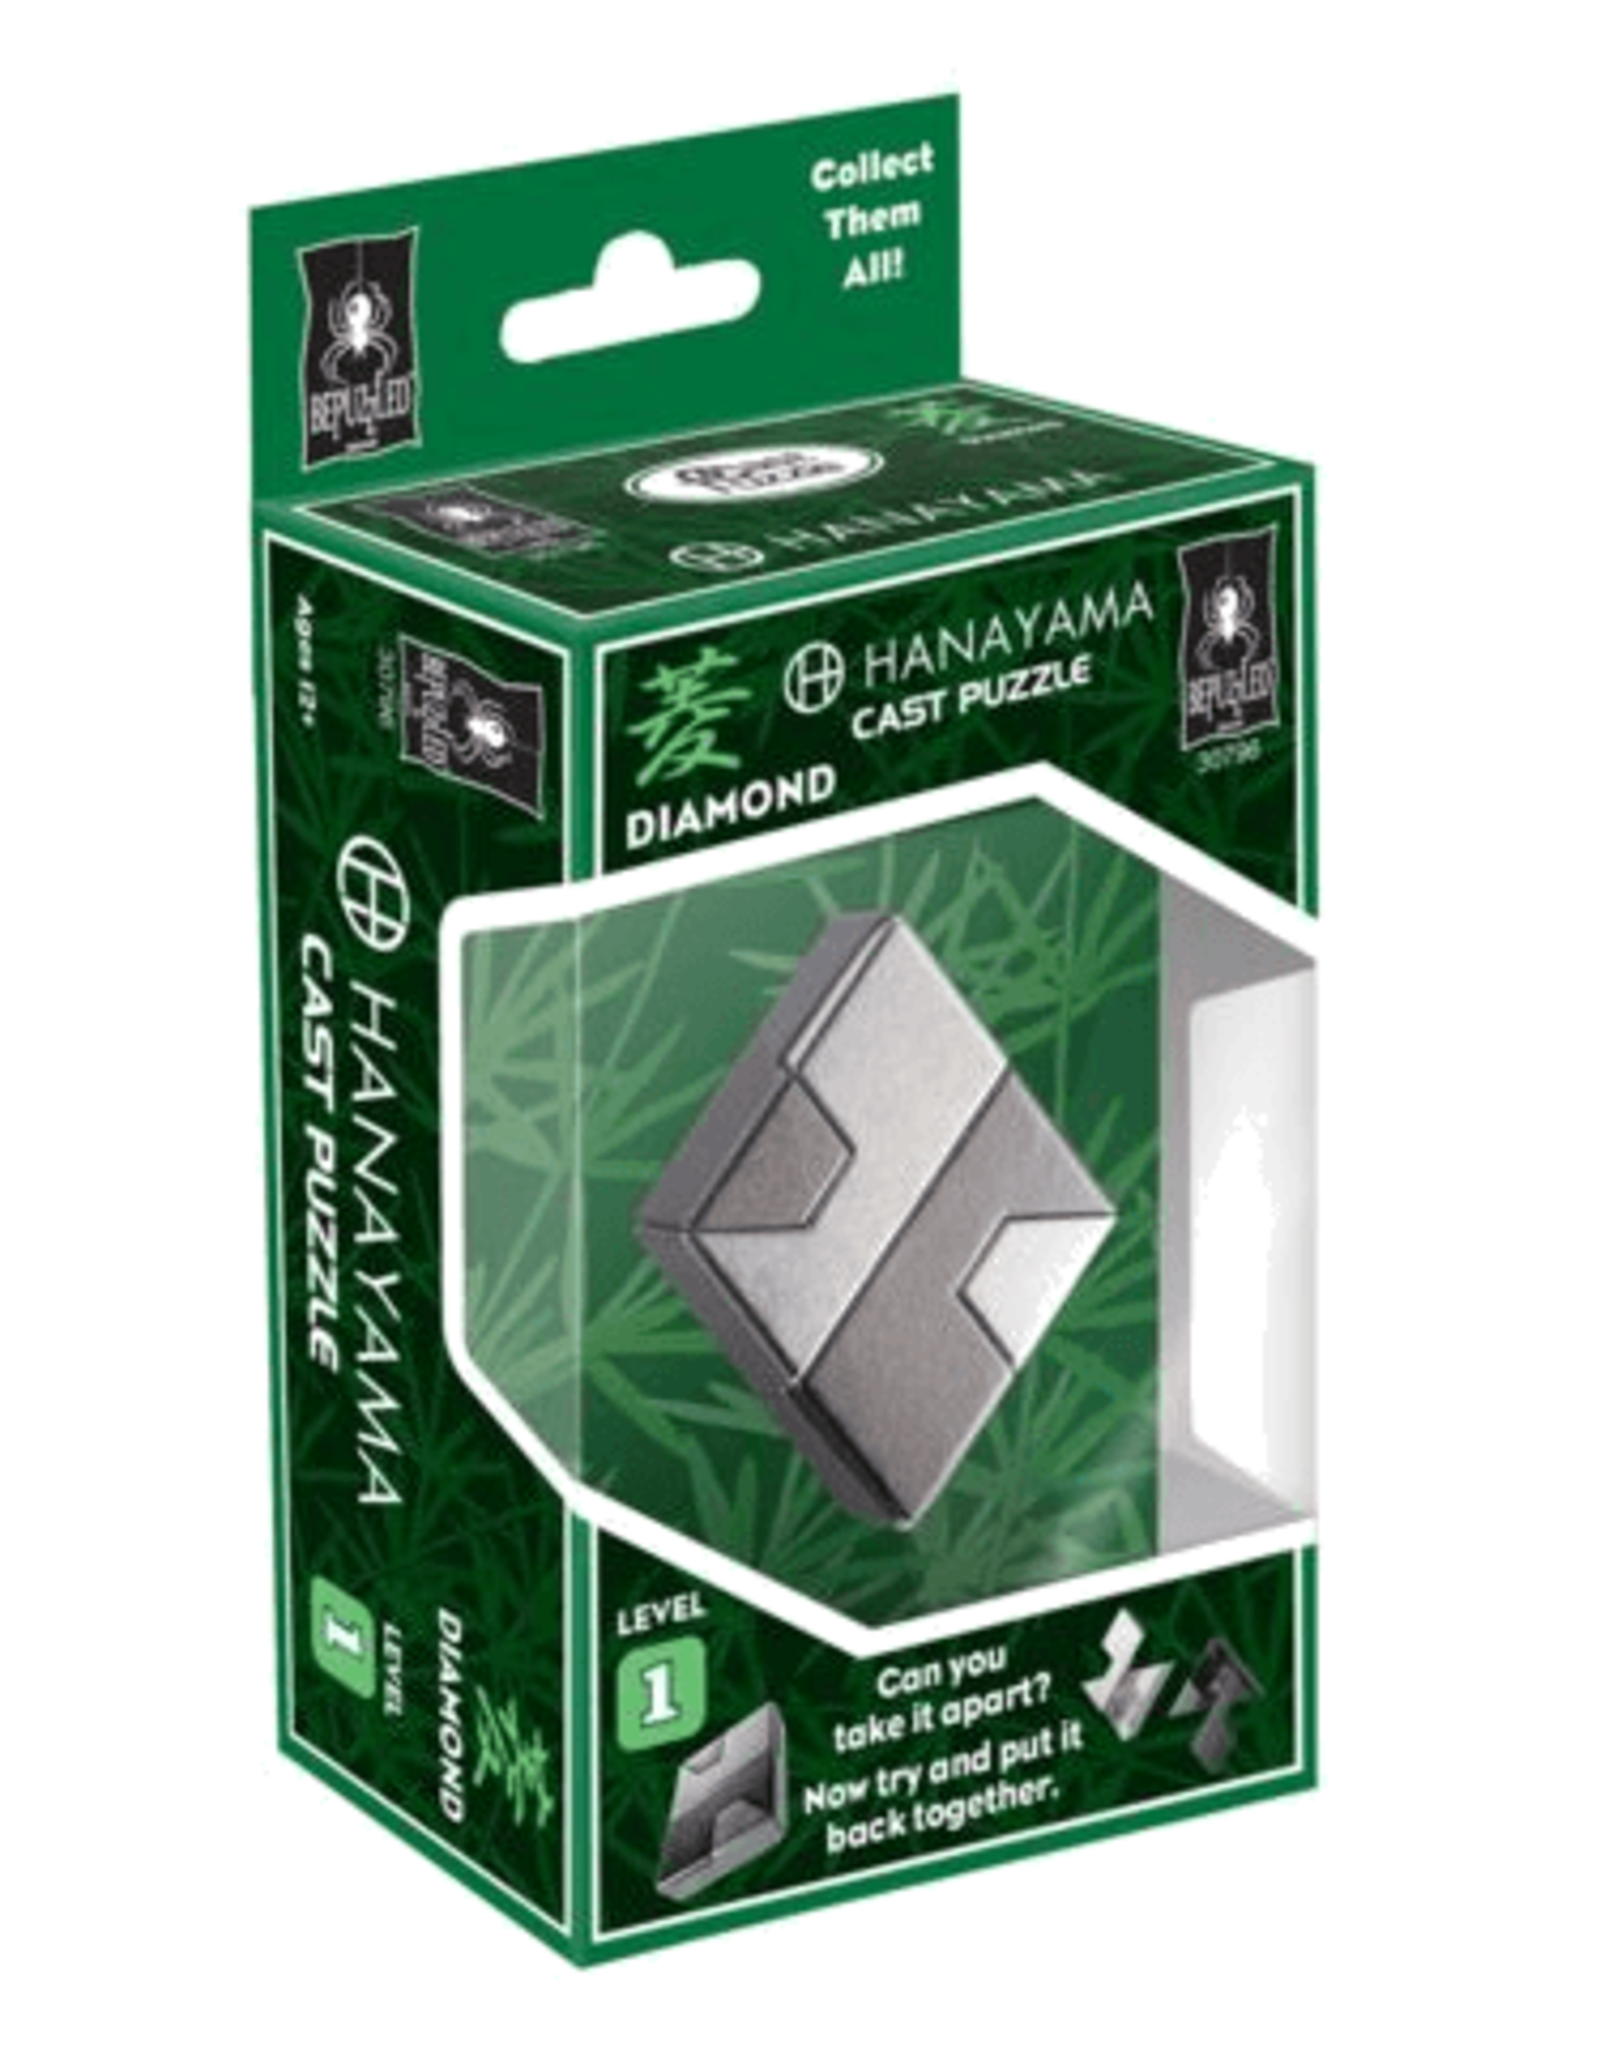 University Games Hanayama Lvl 1 Diamond